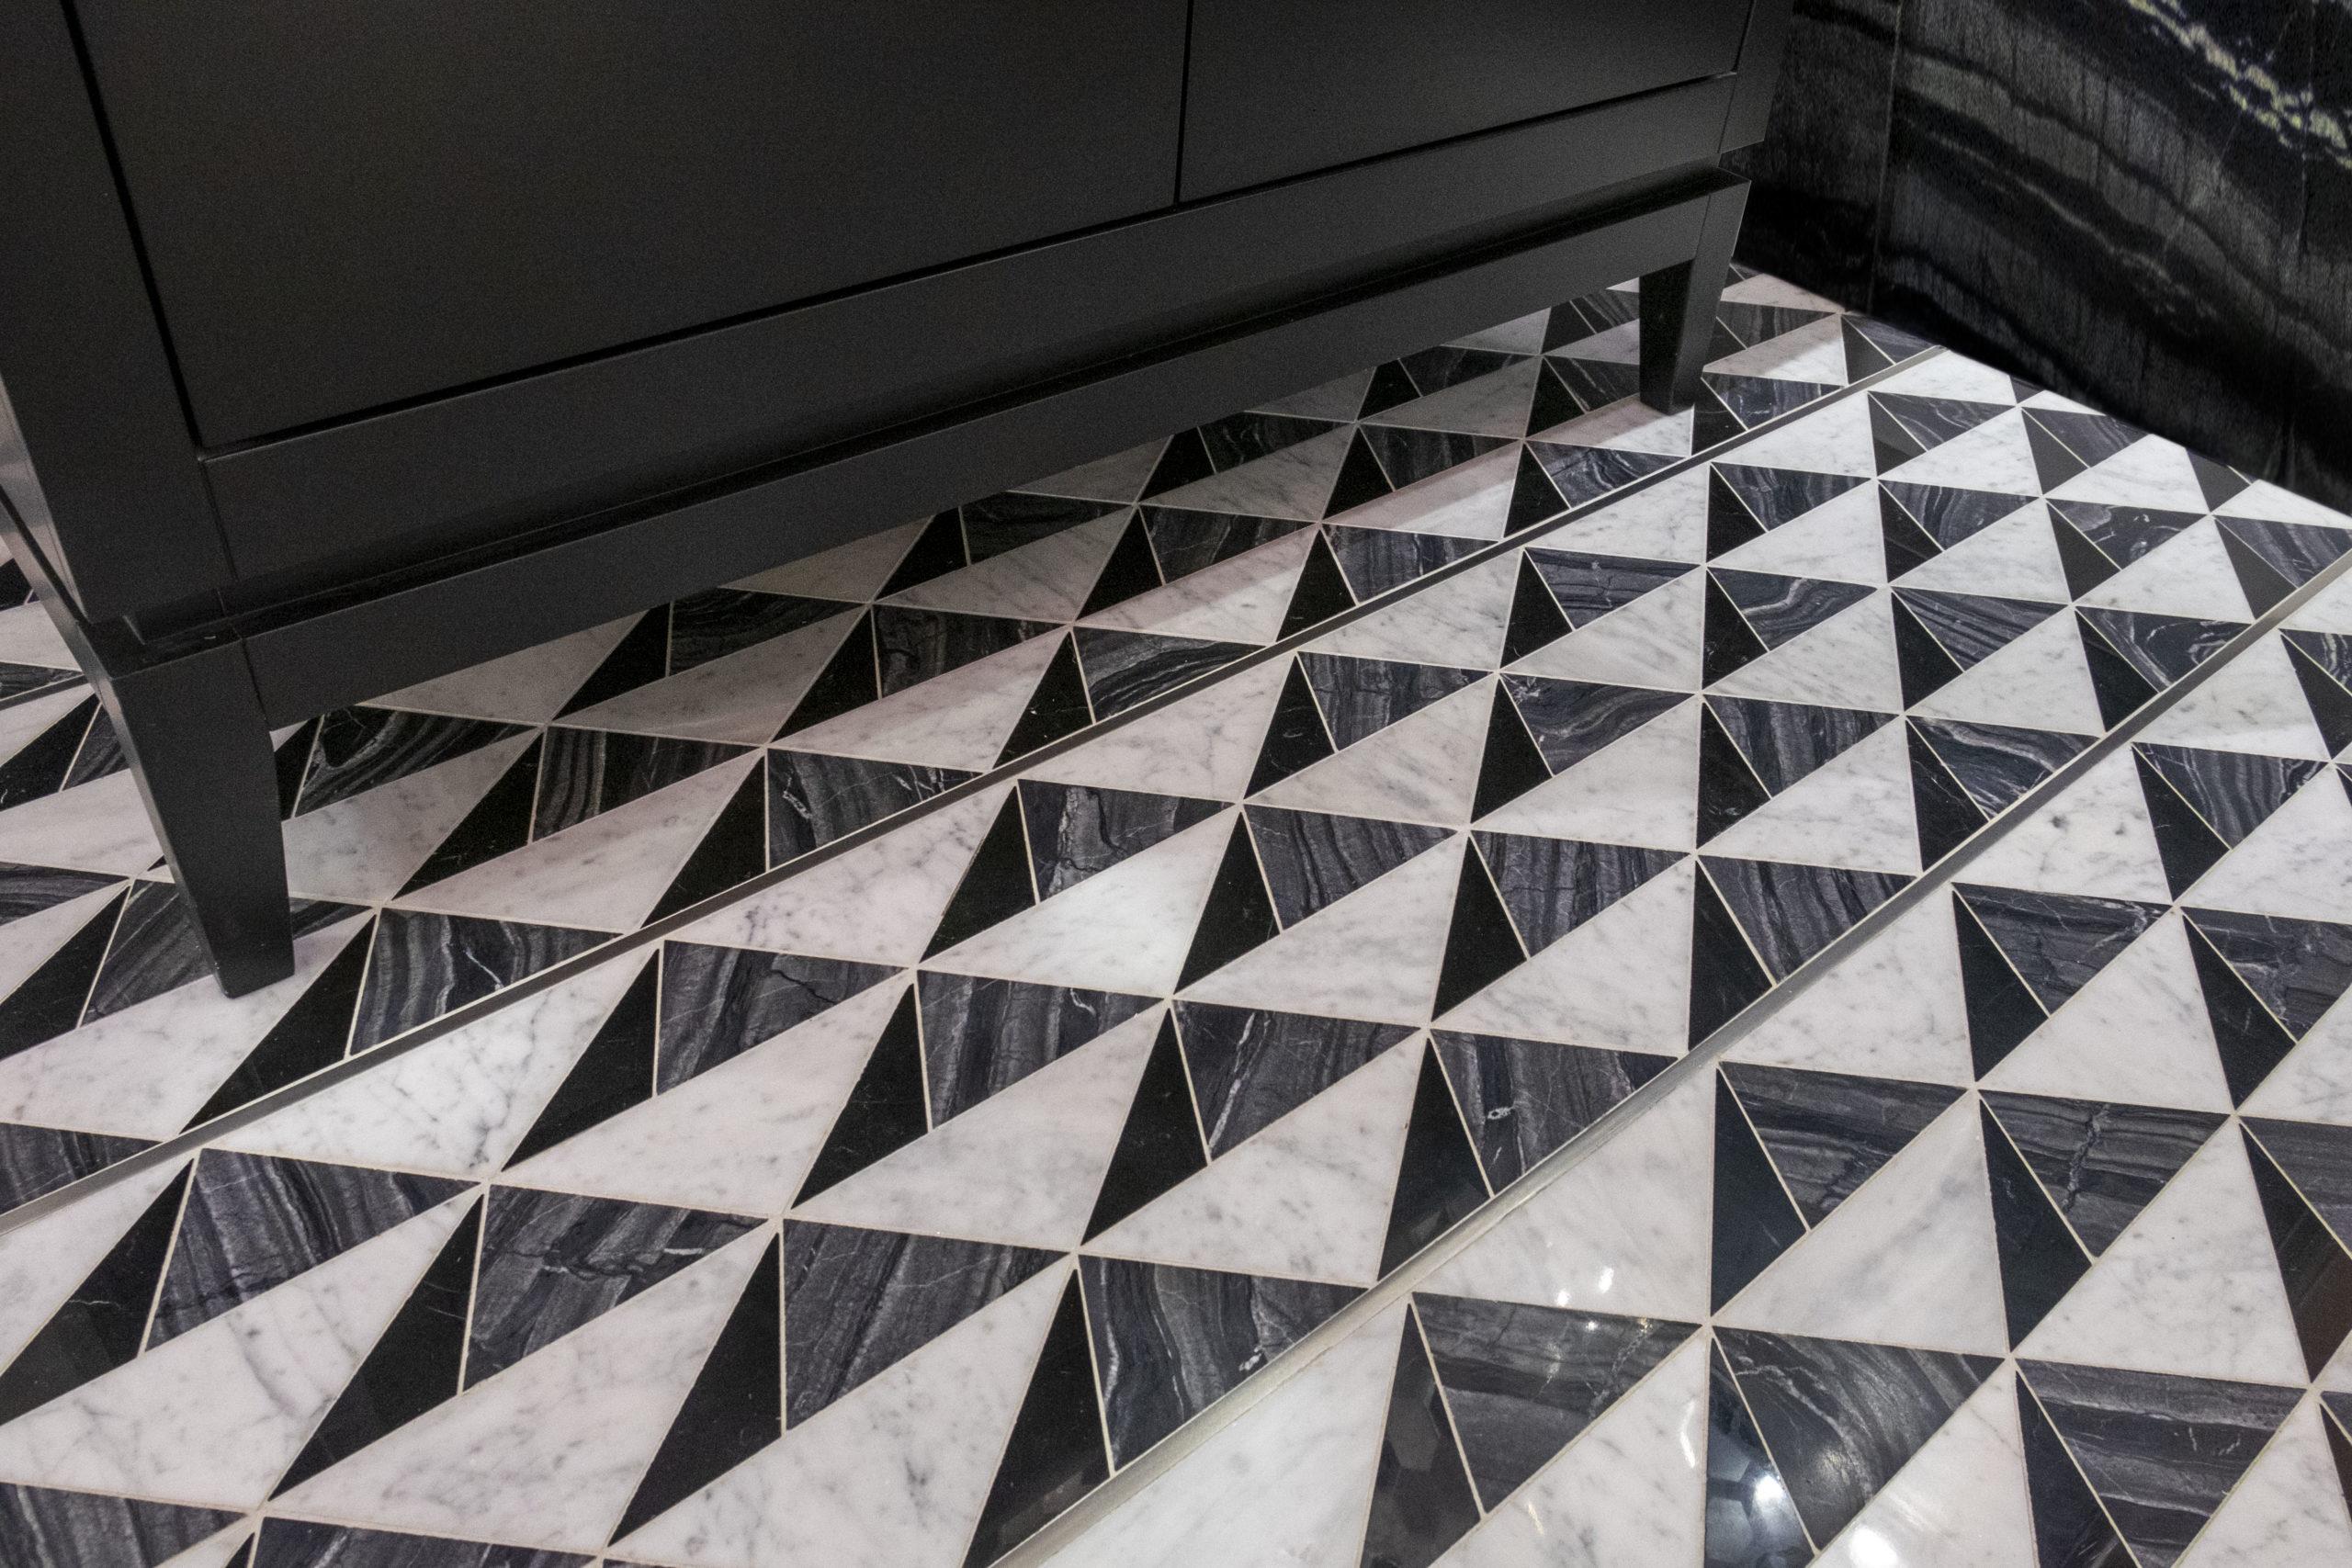 Bronzework-Studio---Precision-Liner-Stainless-Steel-stone-patterned-floor-black-white